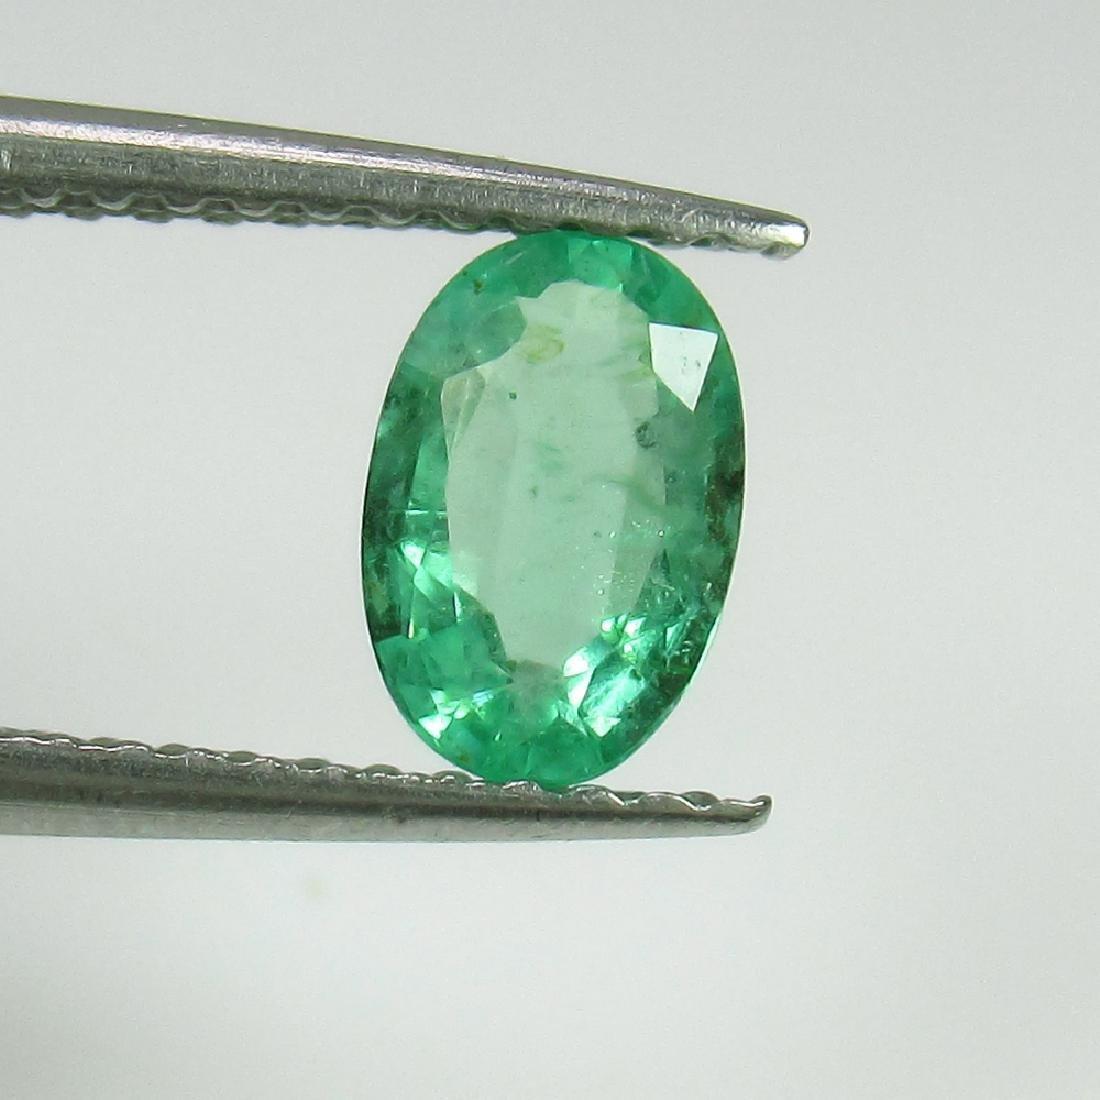 0.56 Ct Genuine Zambian Emerald Nice Oval Cut